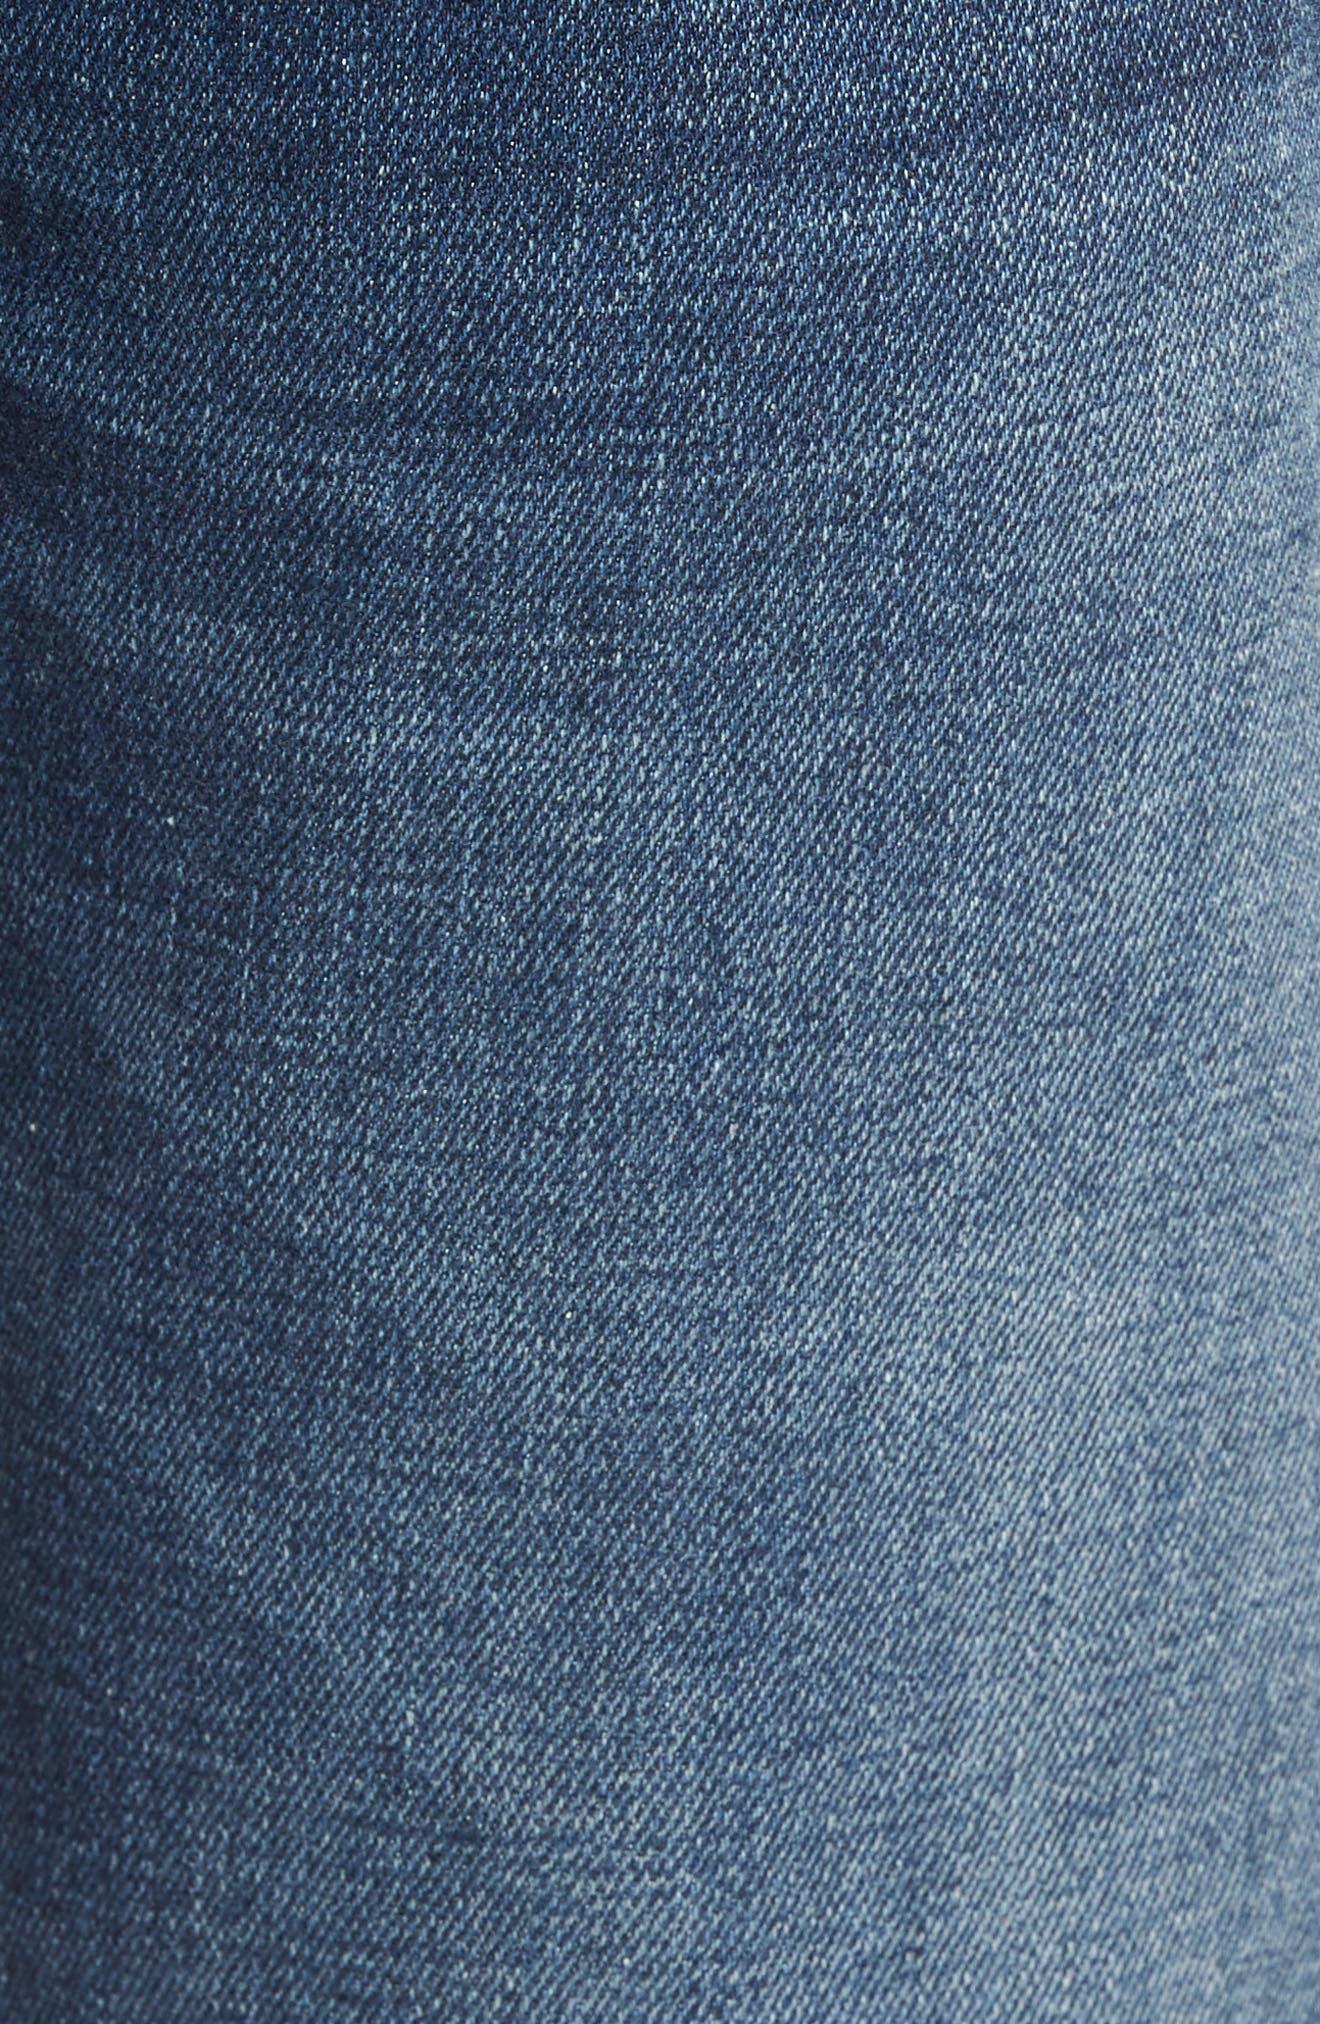 Jake Easy Slim Fit Jeans,                             Alternate thumbnail 5, color,                             401